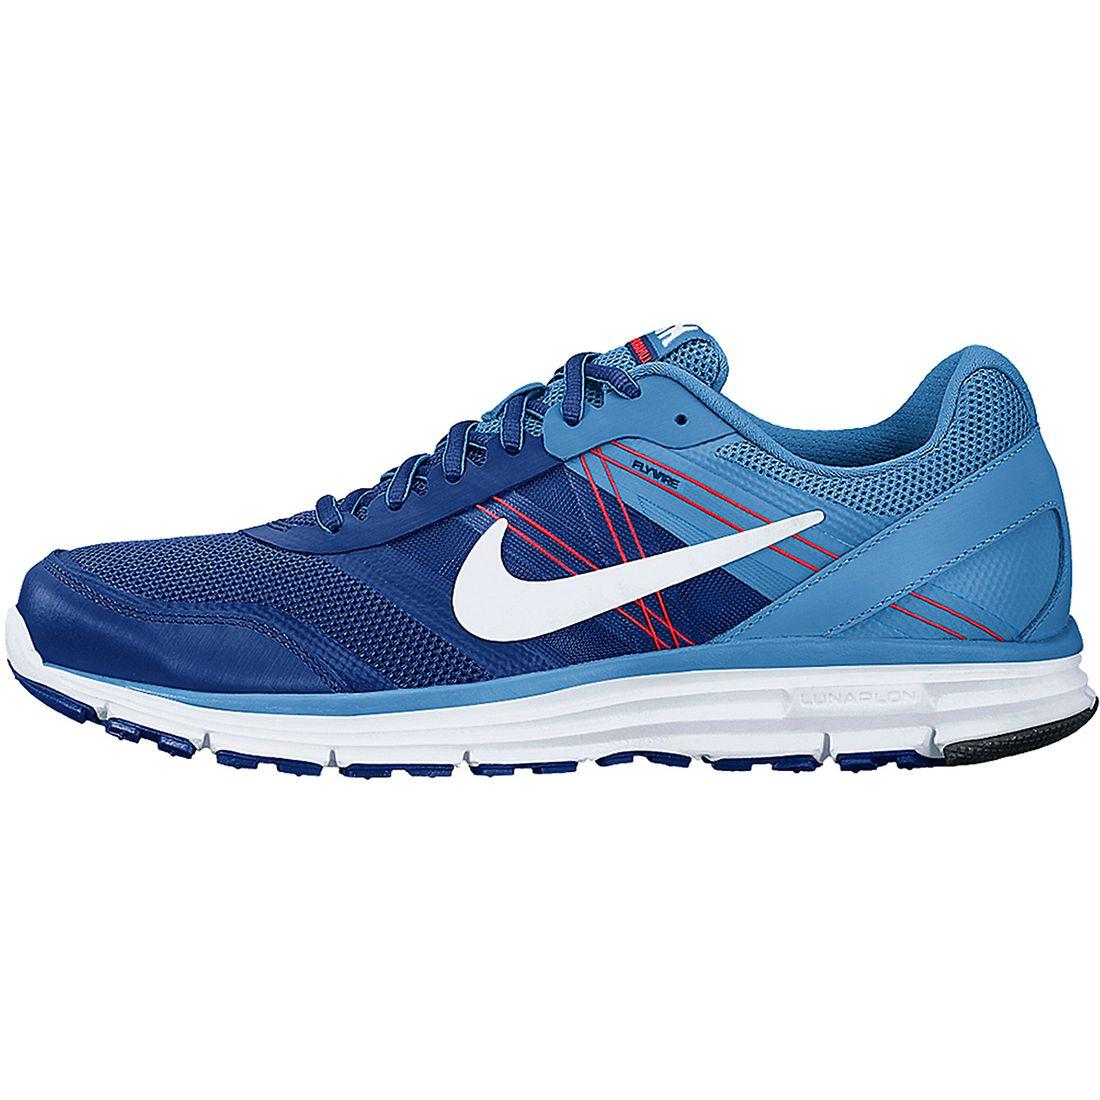 nouveau style ba1e6 fbc52 Nike Lunar Forever 4 Msl Koşu Spor Ayakkabısı 704913401